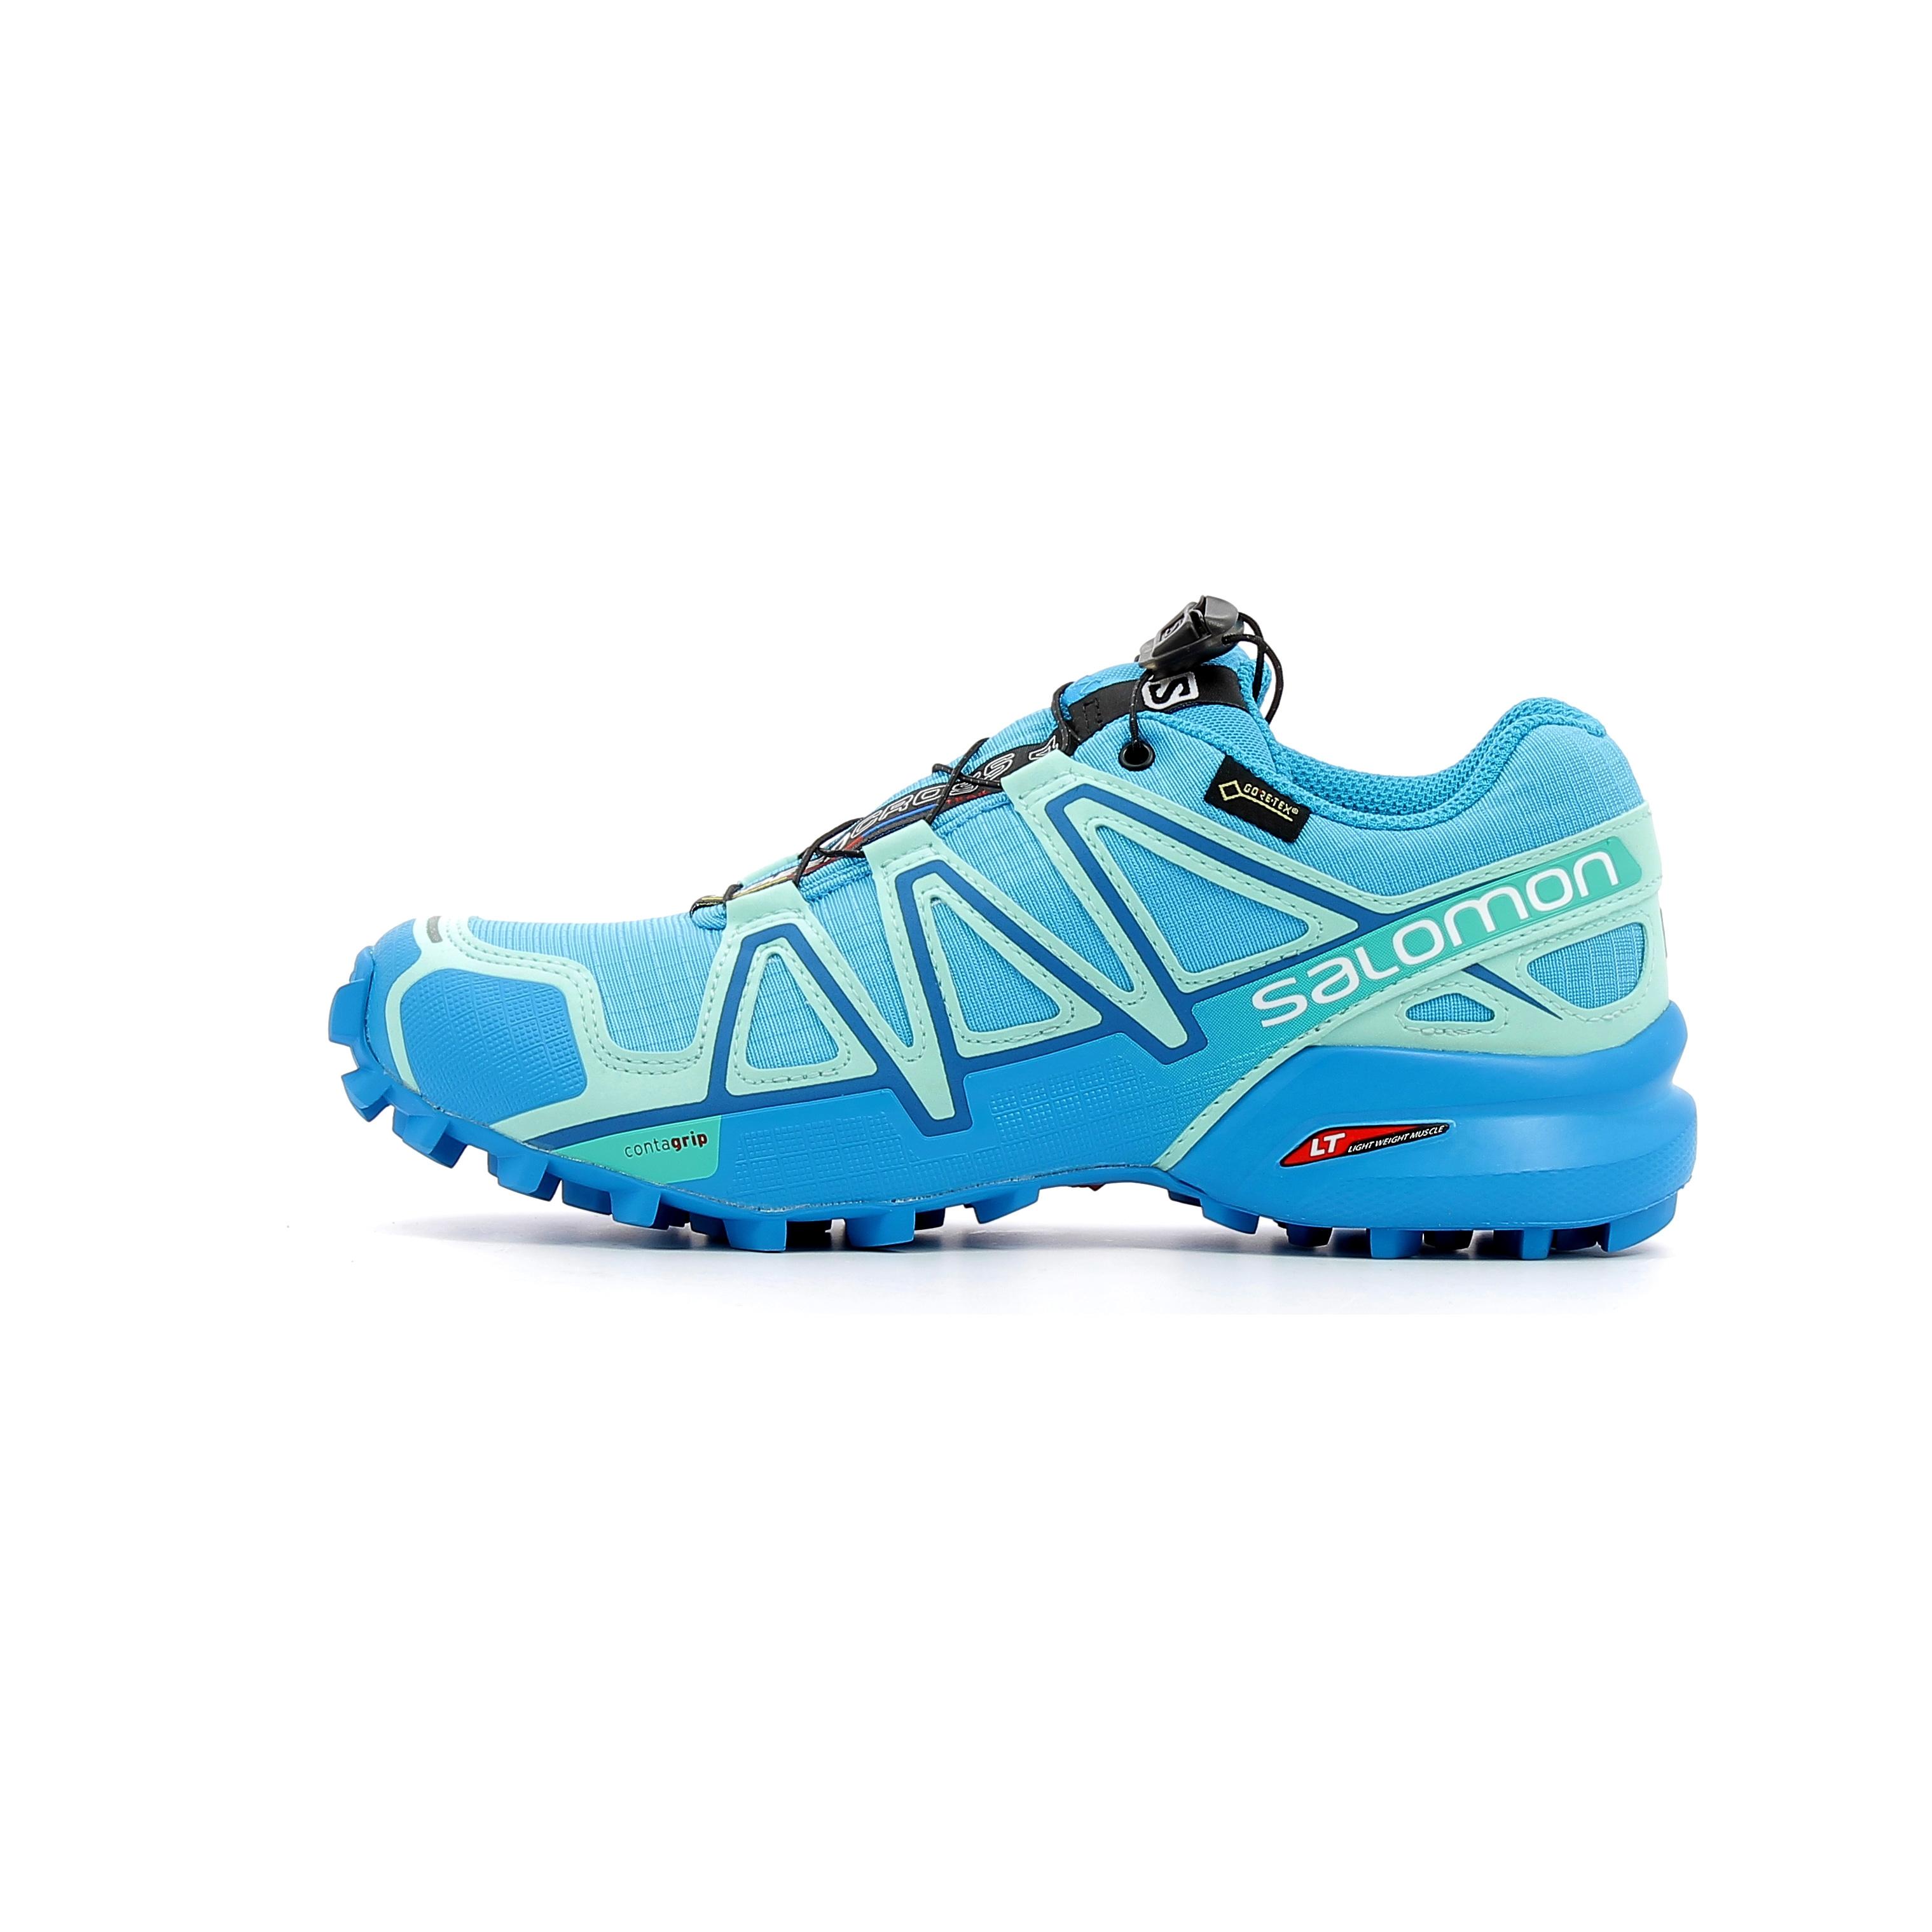 promo code 686ef 61e7c Chaussures de Trail Femme Salomon Speedcross 4 GTX W Bleu